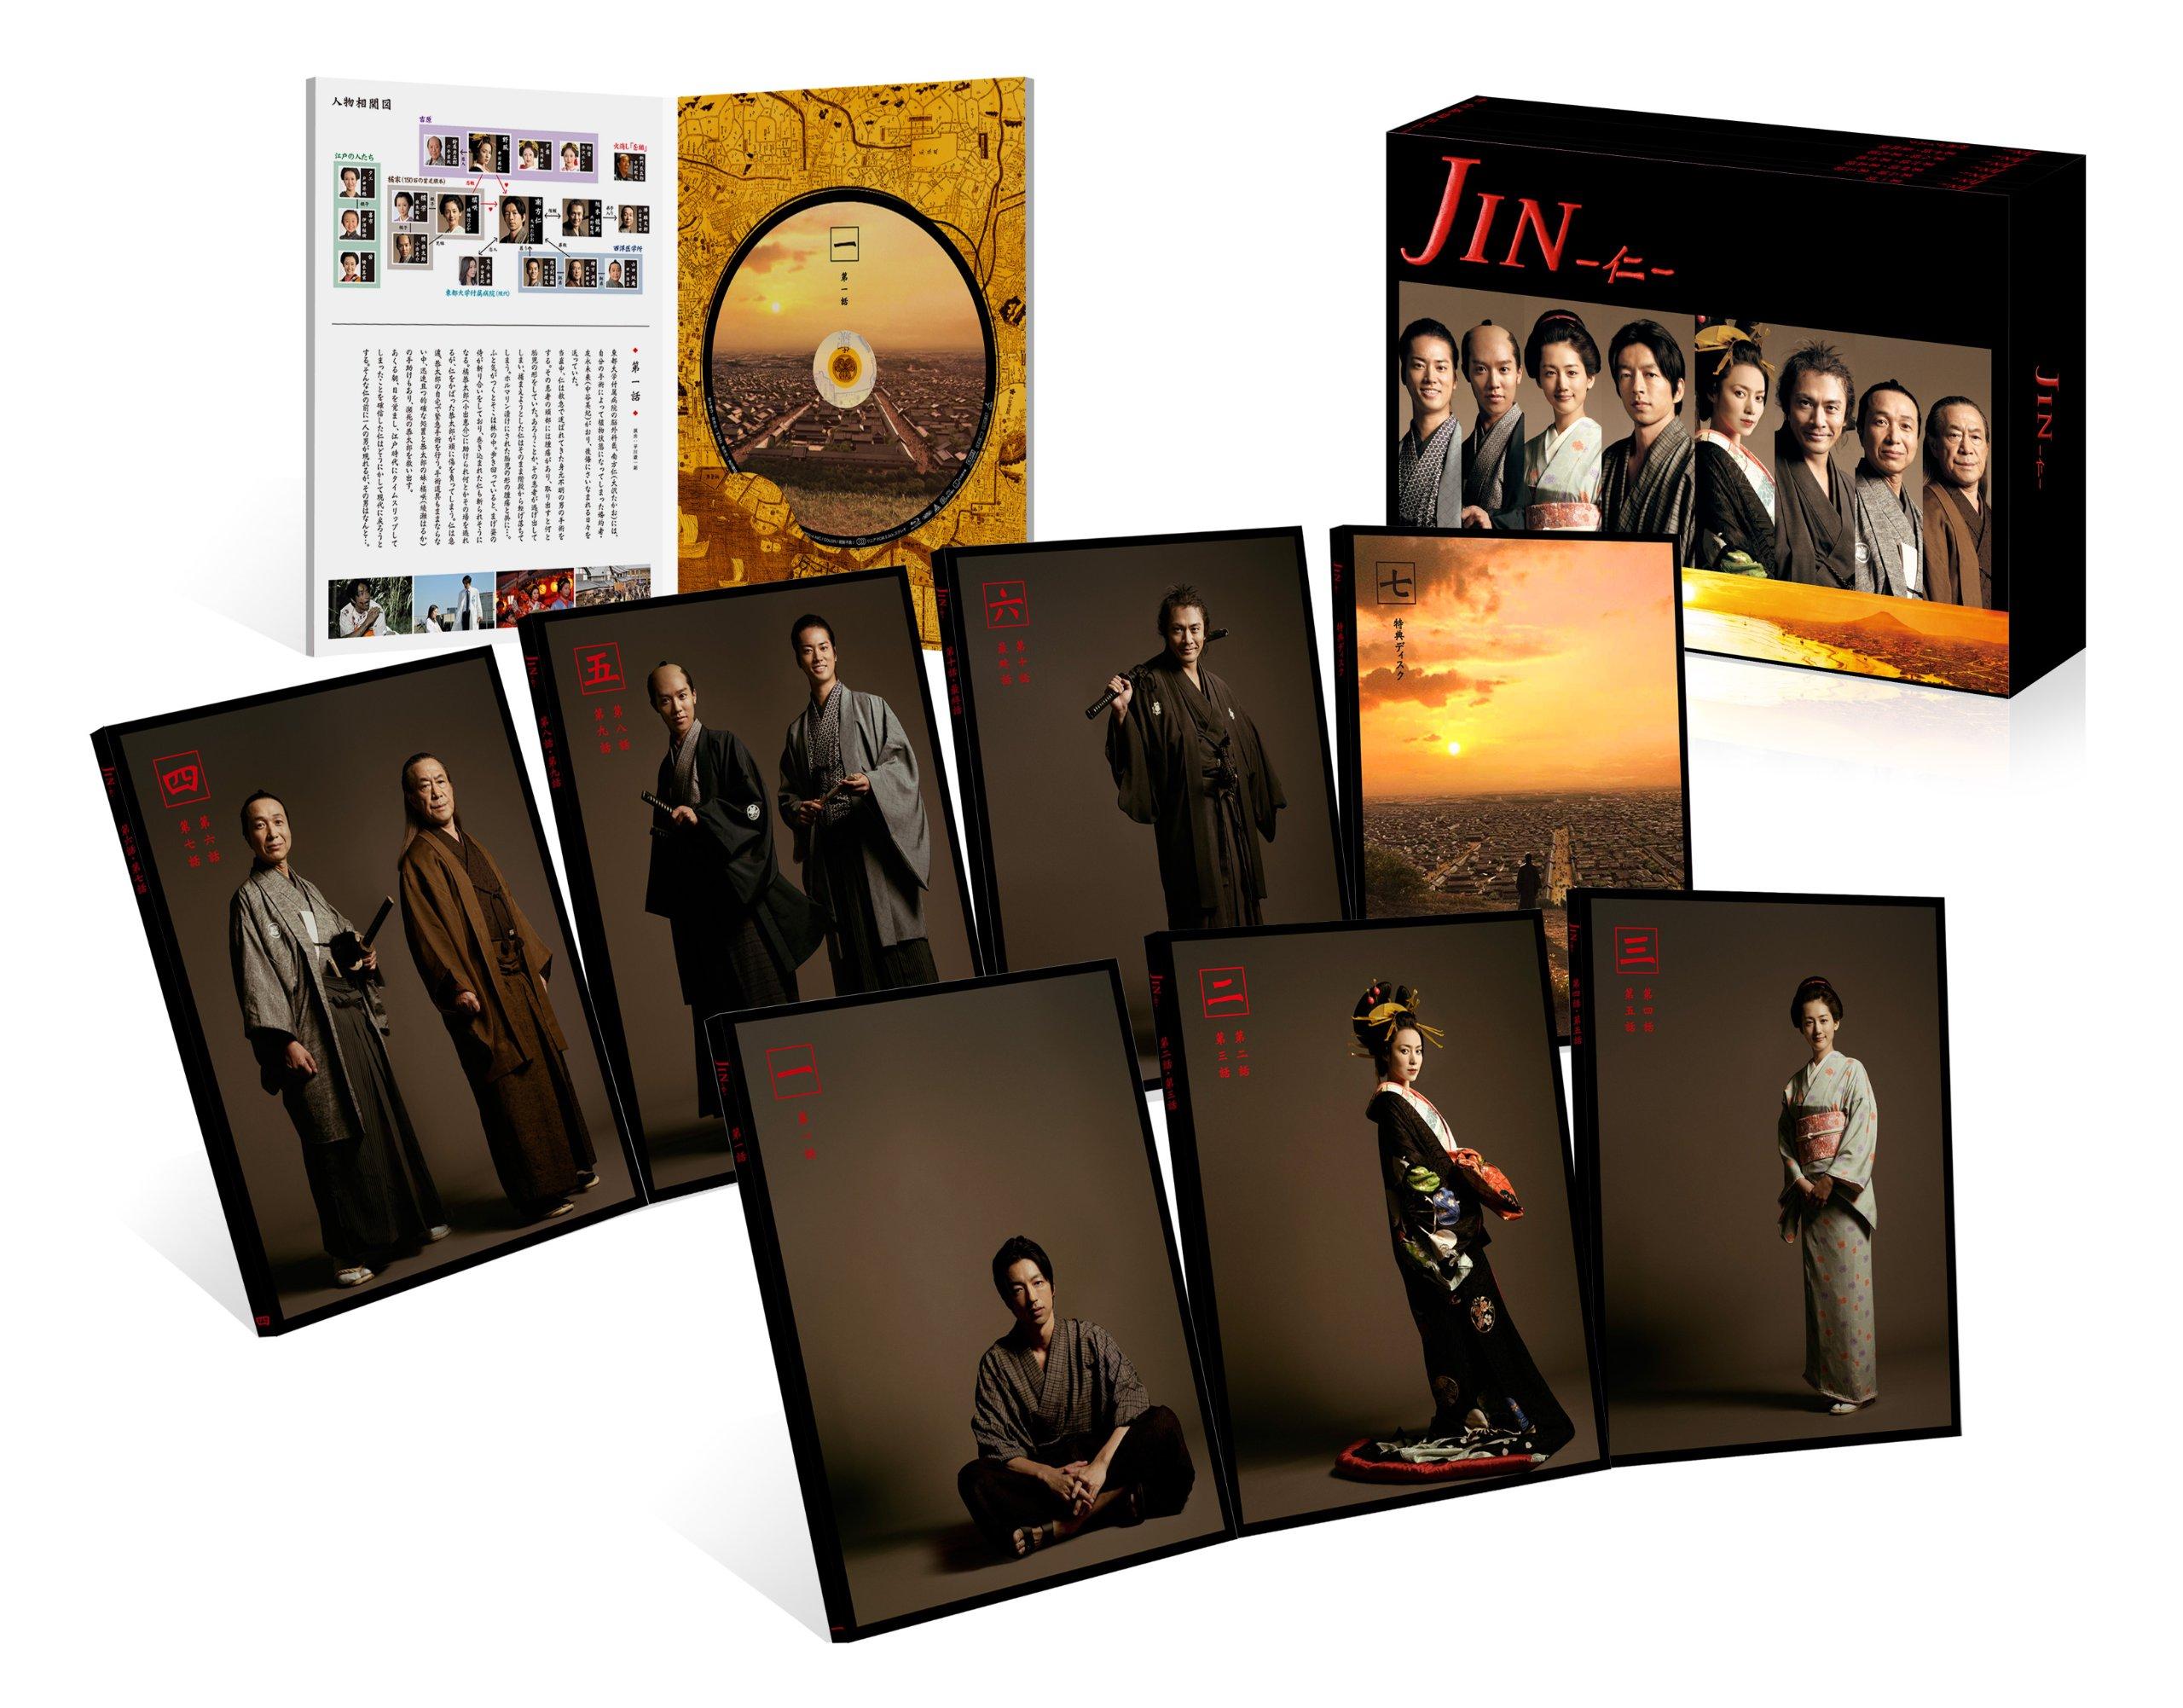 JIN Japanese TV Series Blu-ray Box 7 Disc by